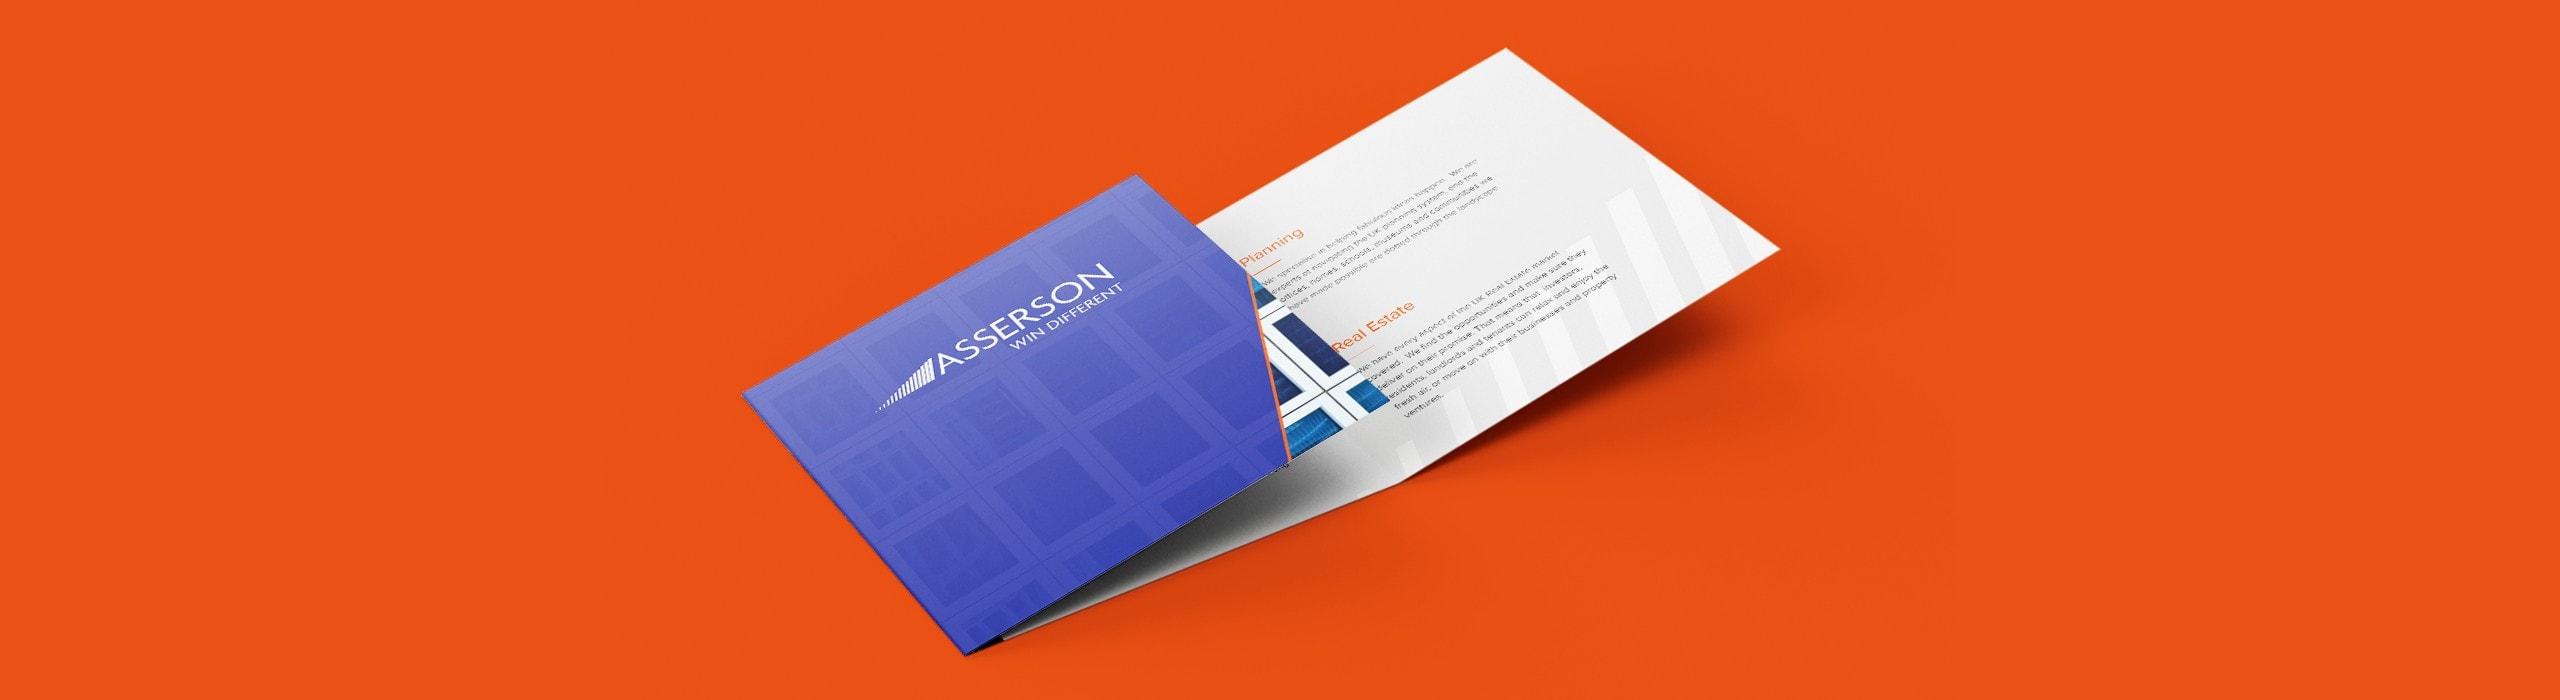 Asserson - natie-asserson-brochure - Natie Branding Agency